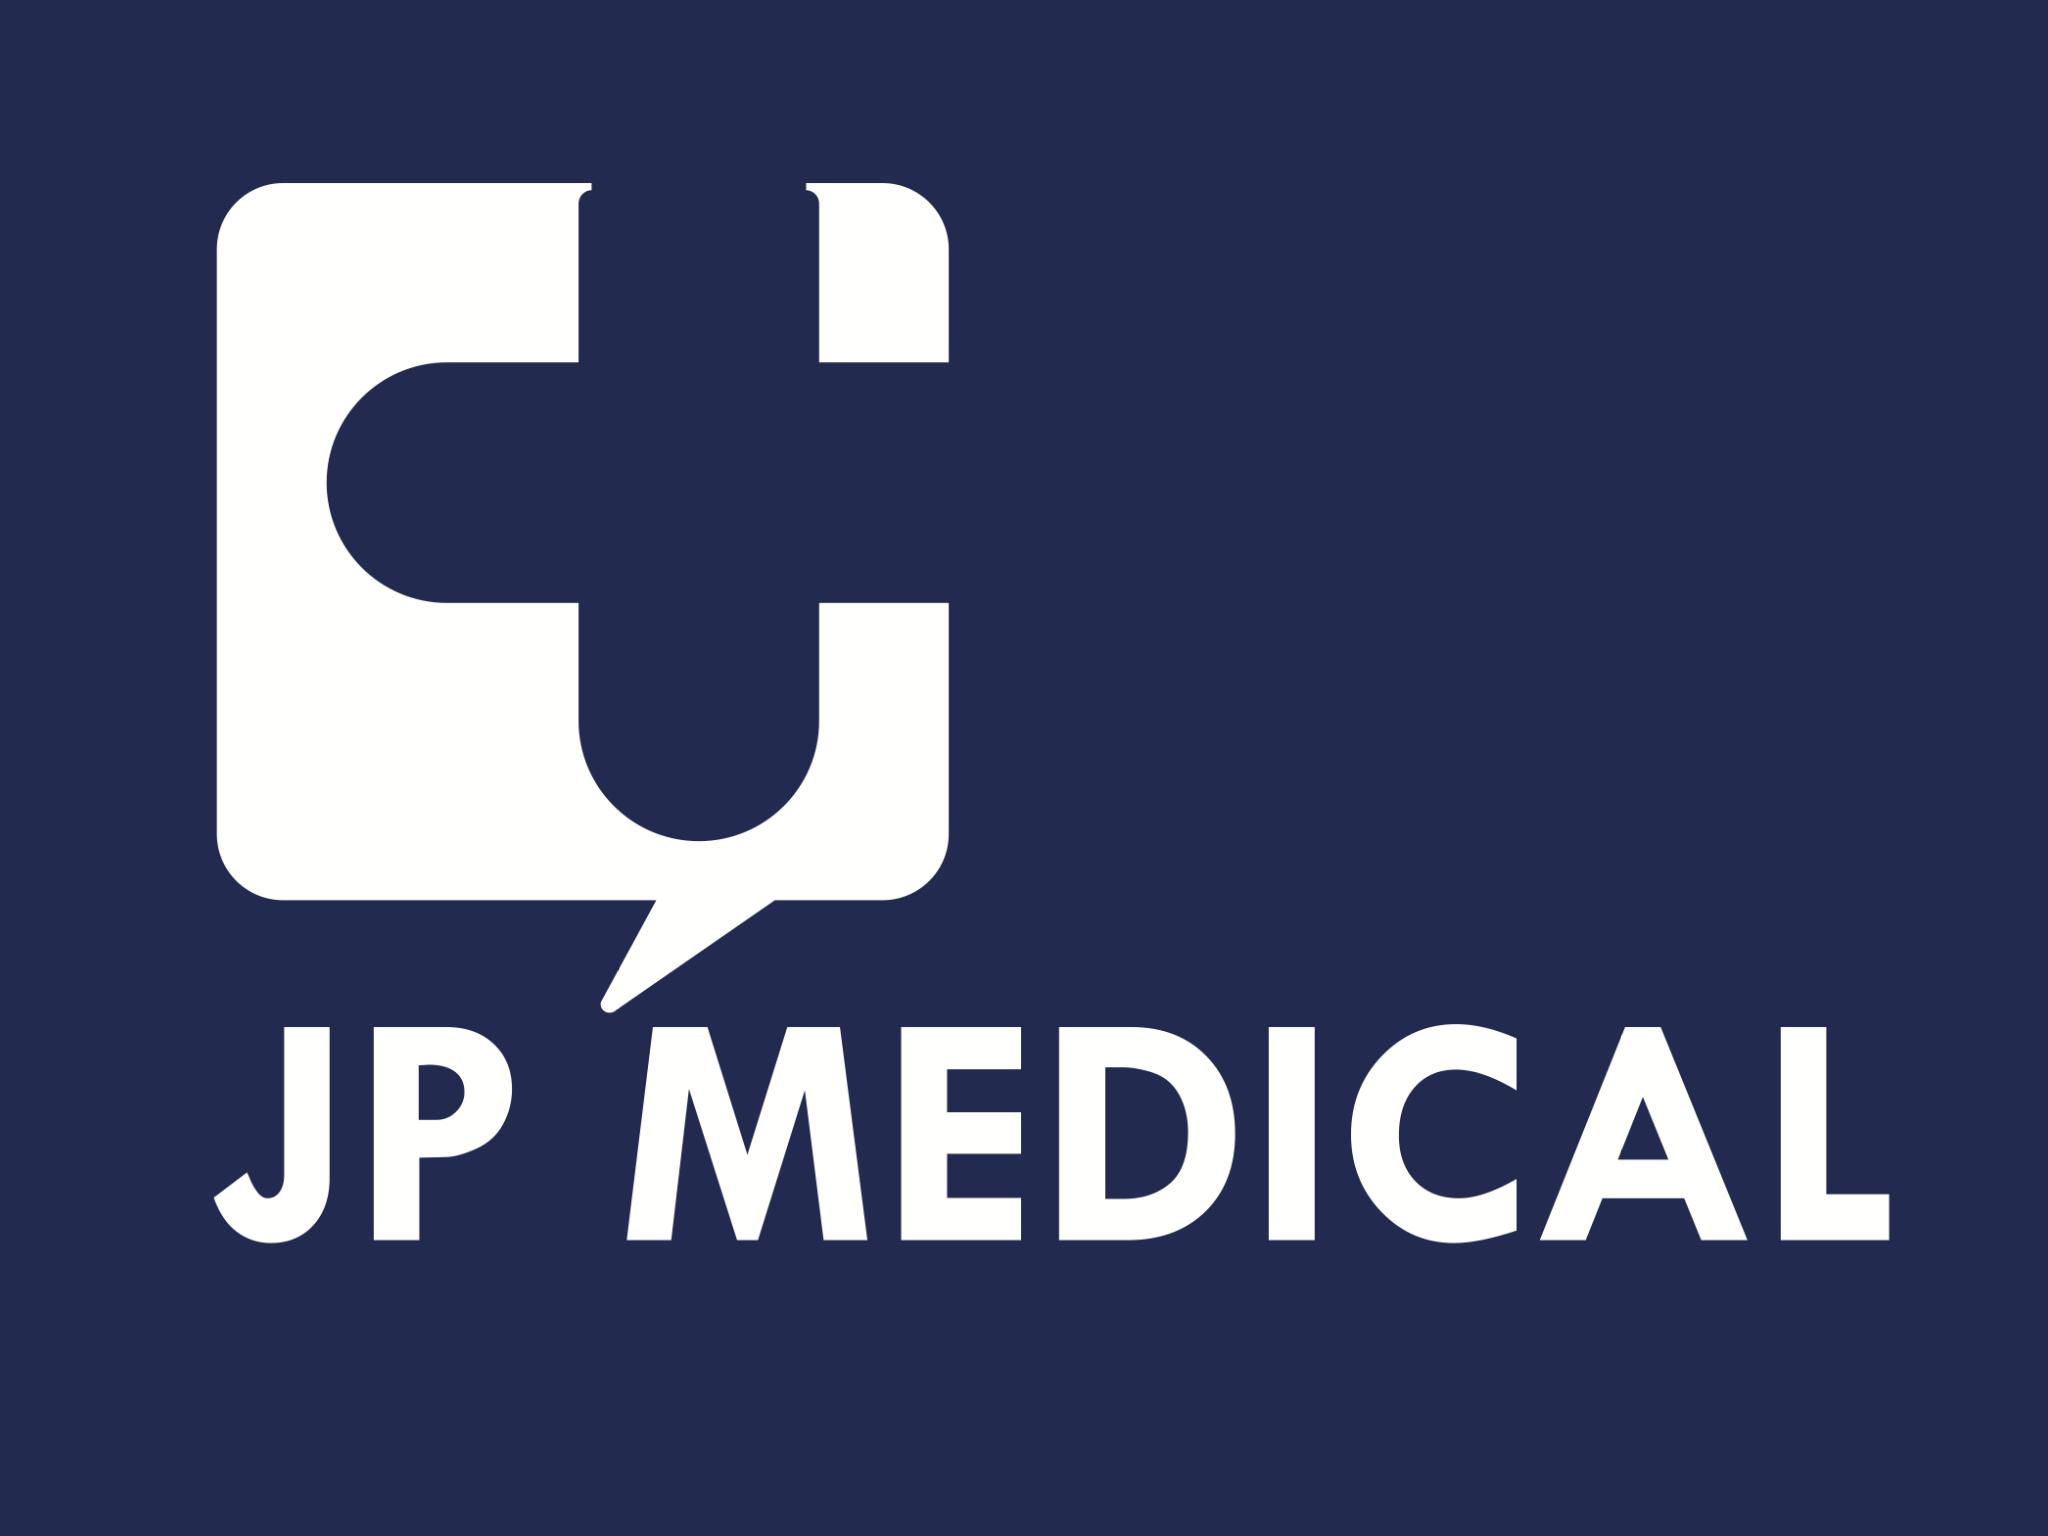 jpmedical